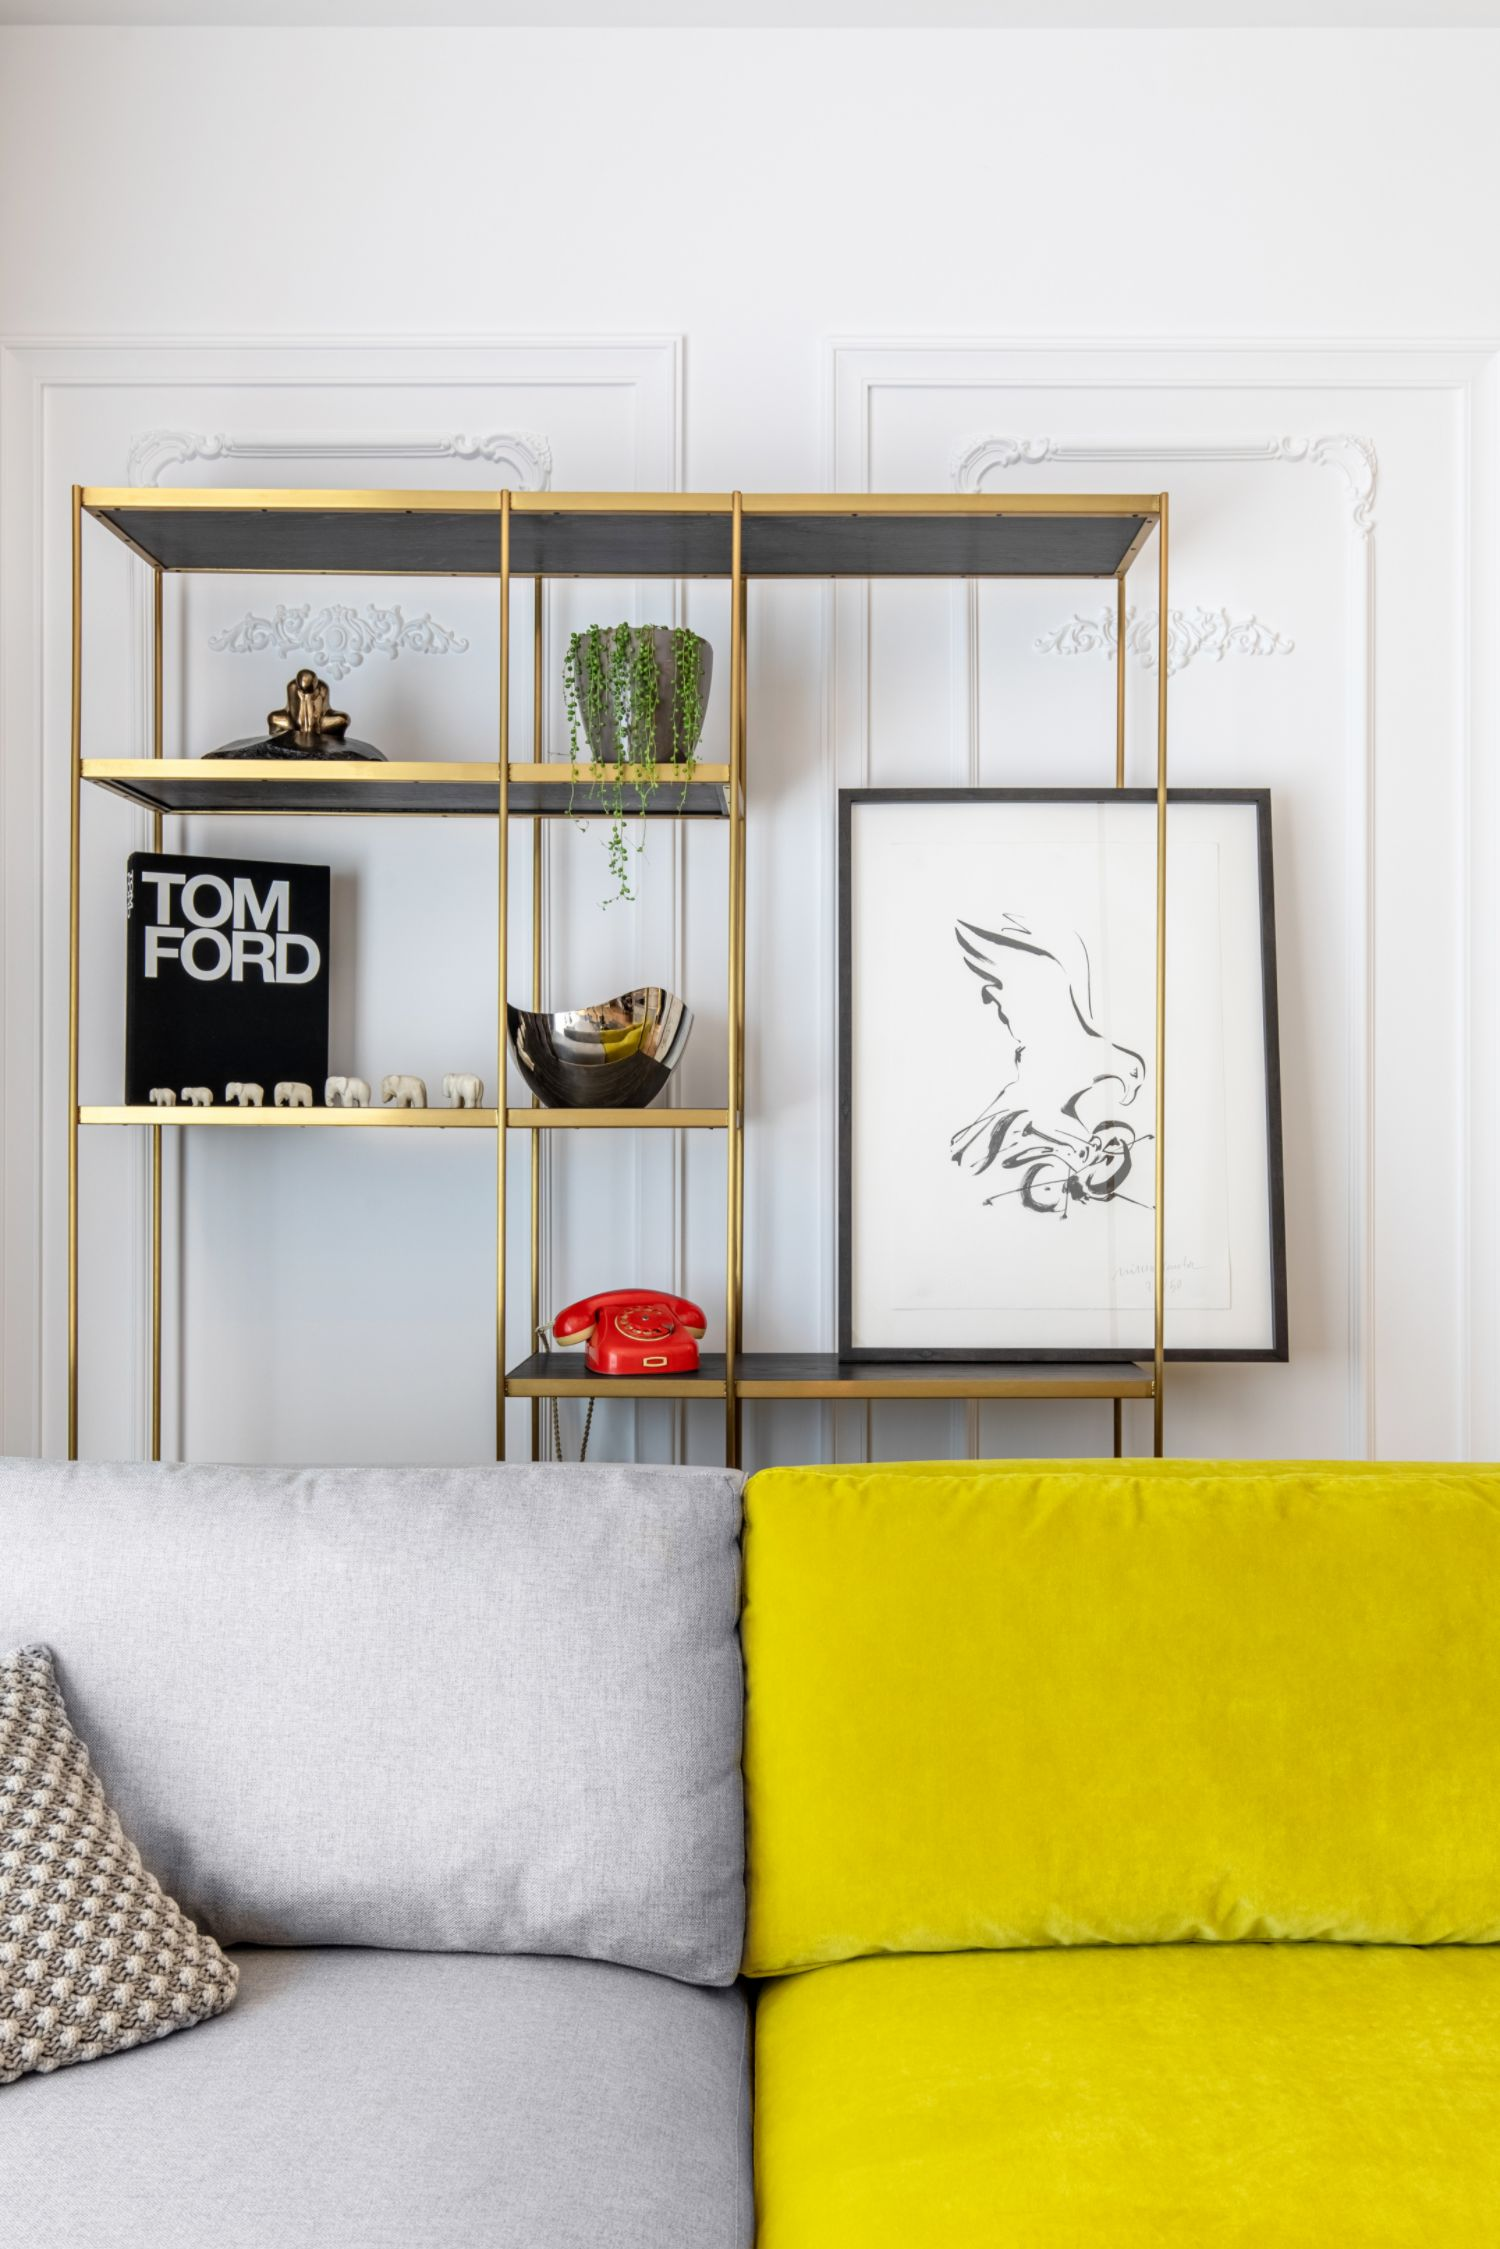 Amenajare vila duplex Otopeni stil eclectic - Sergiu Califar - Pure Mess Design - open space cu canapea galben gri Ditre Italia 2 (1)